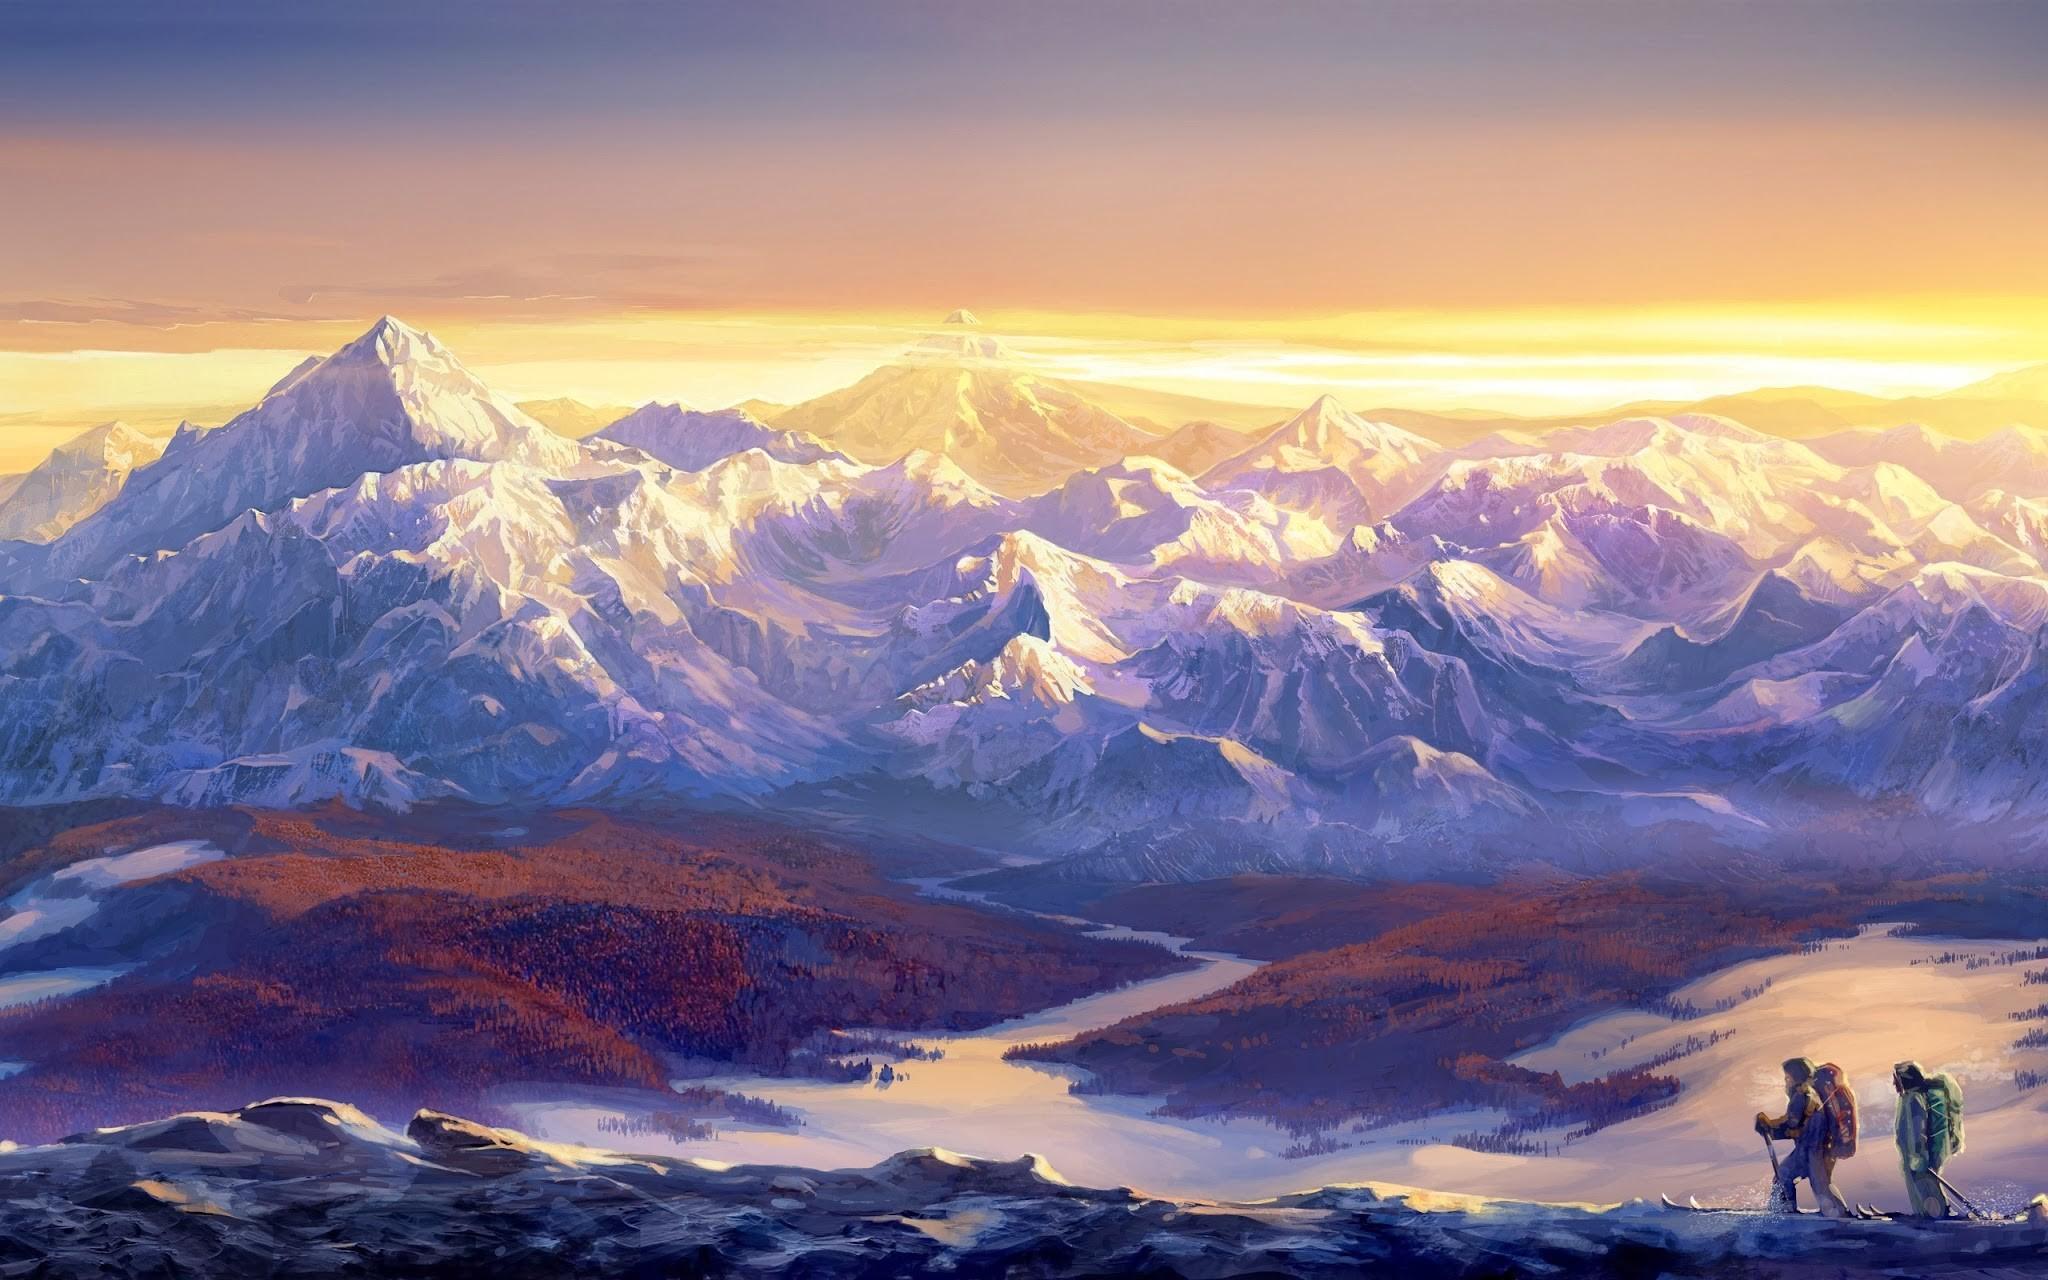 Wallpaper Pemandangan Matahari Terbenam Karya Seni Matahari